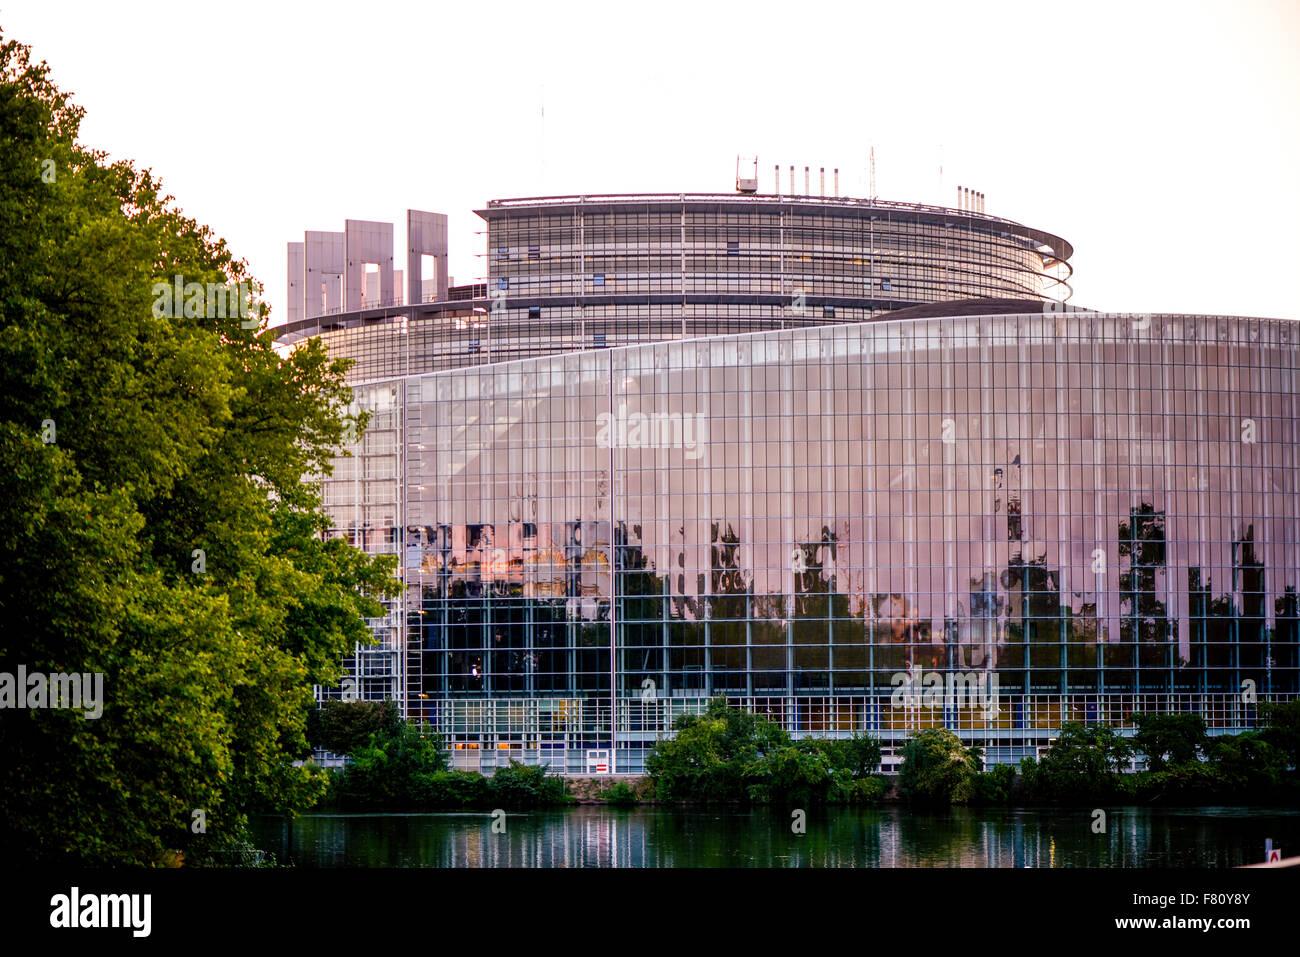 EU-Parlament, Straßburg, Elsass, Frankreich Stockbild